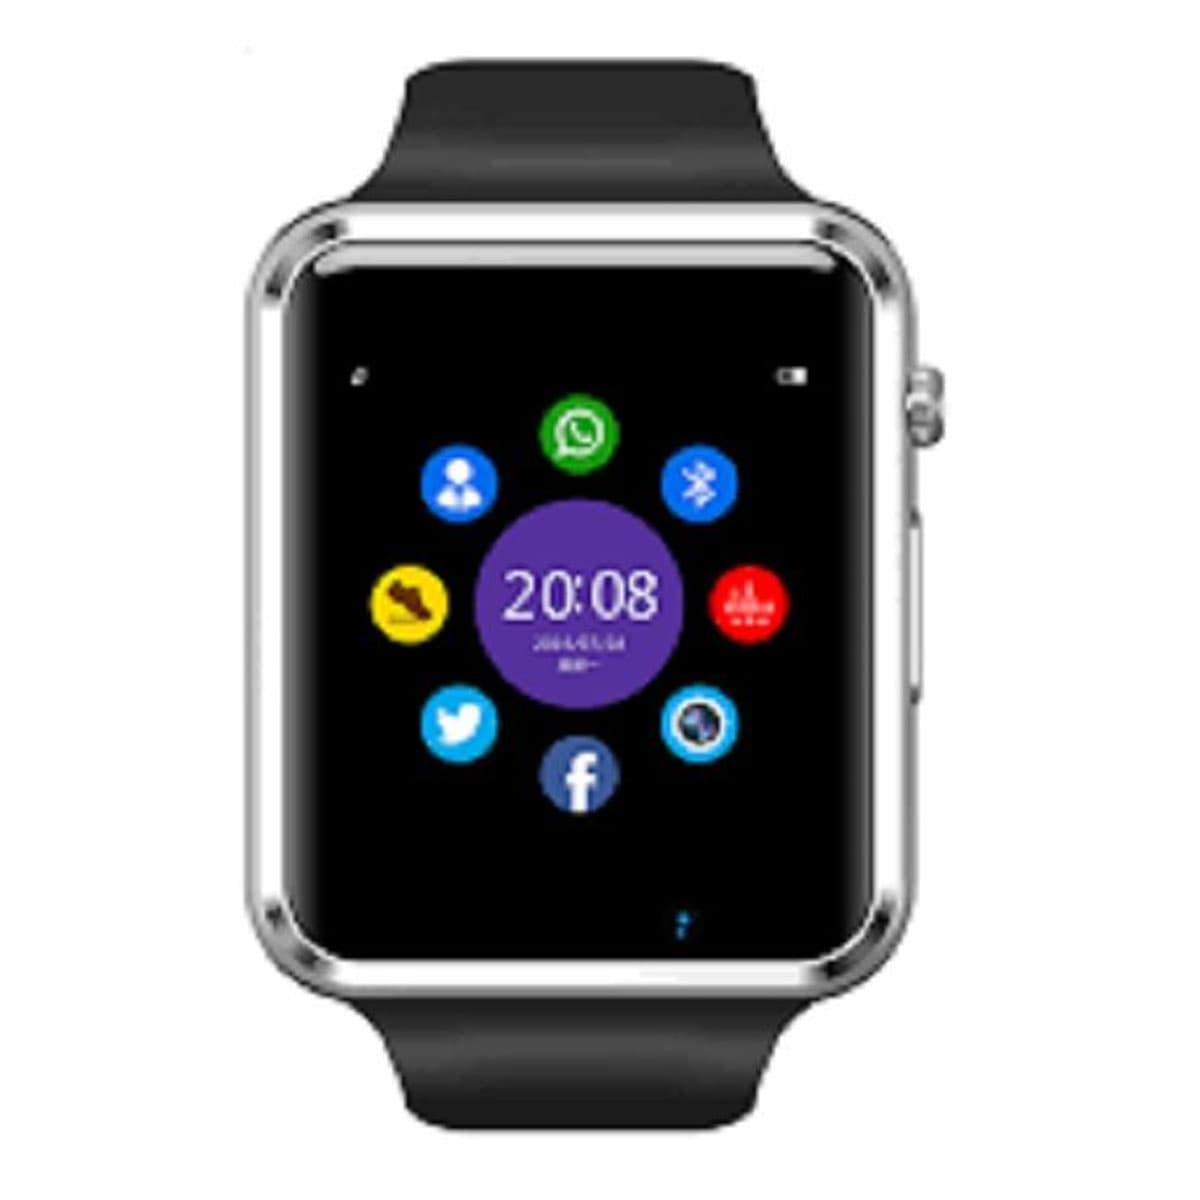 95517f69bb0 A-1 Bluetooth Smart Watch Phone with Pedometer Camera Single SIM - Black